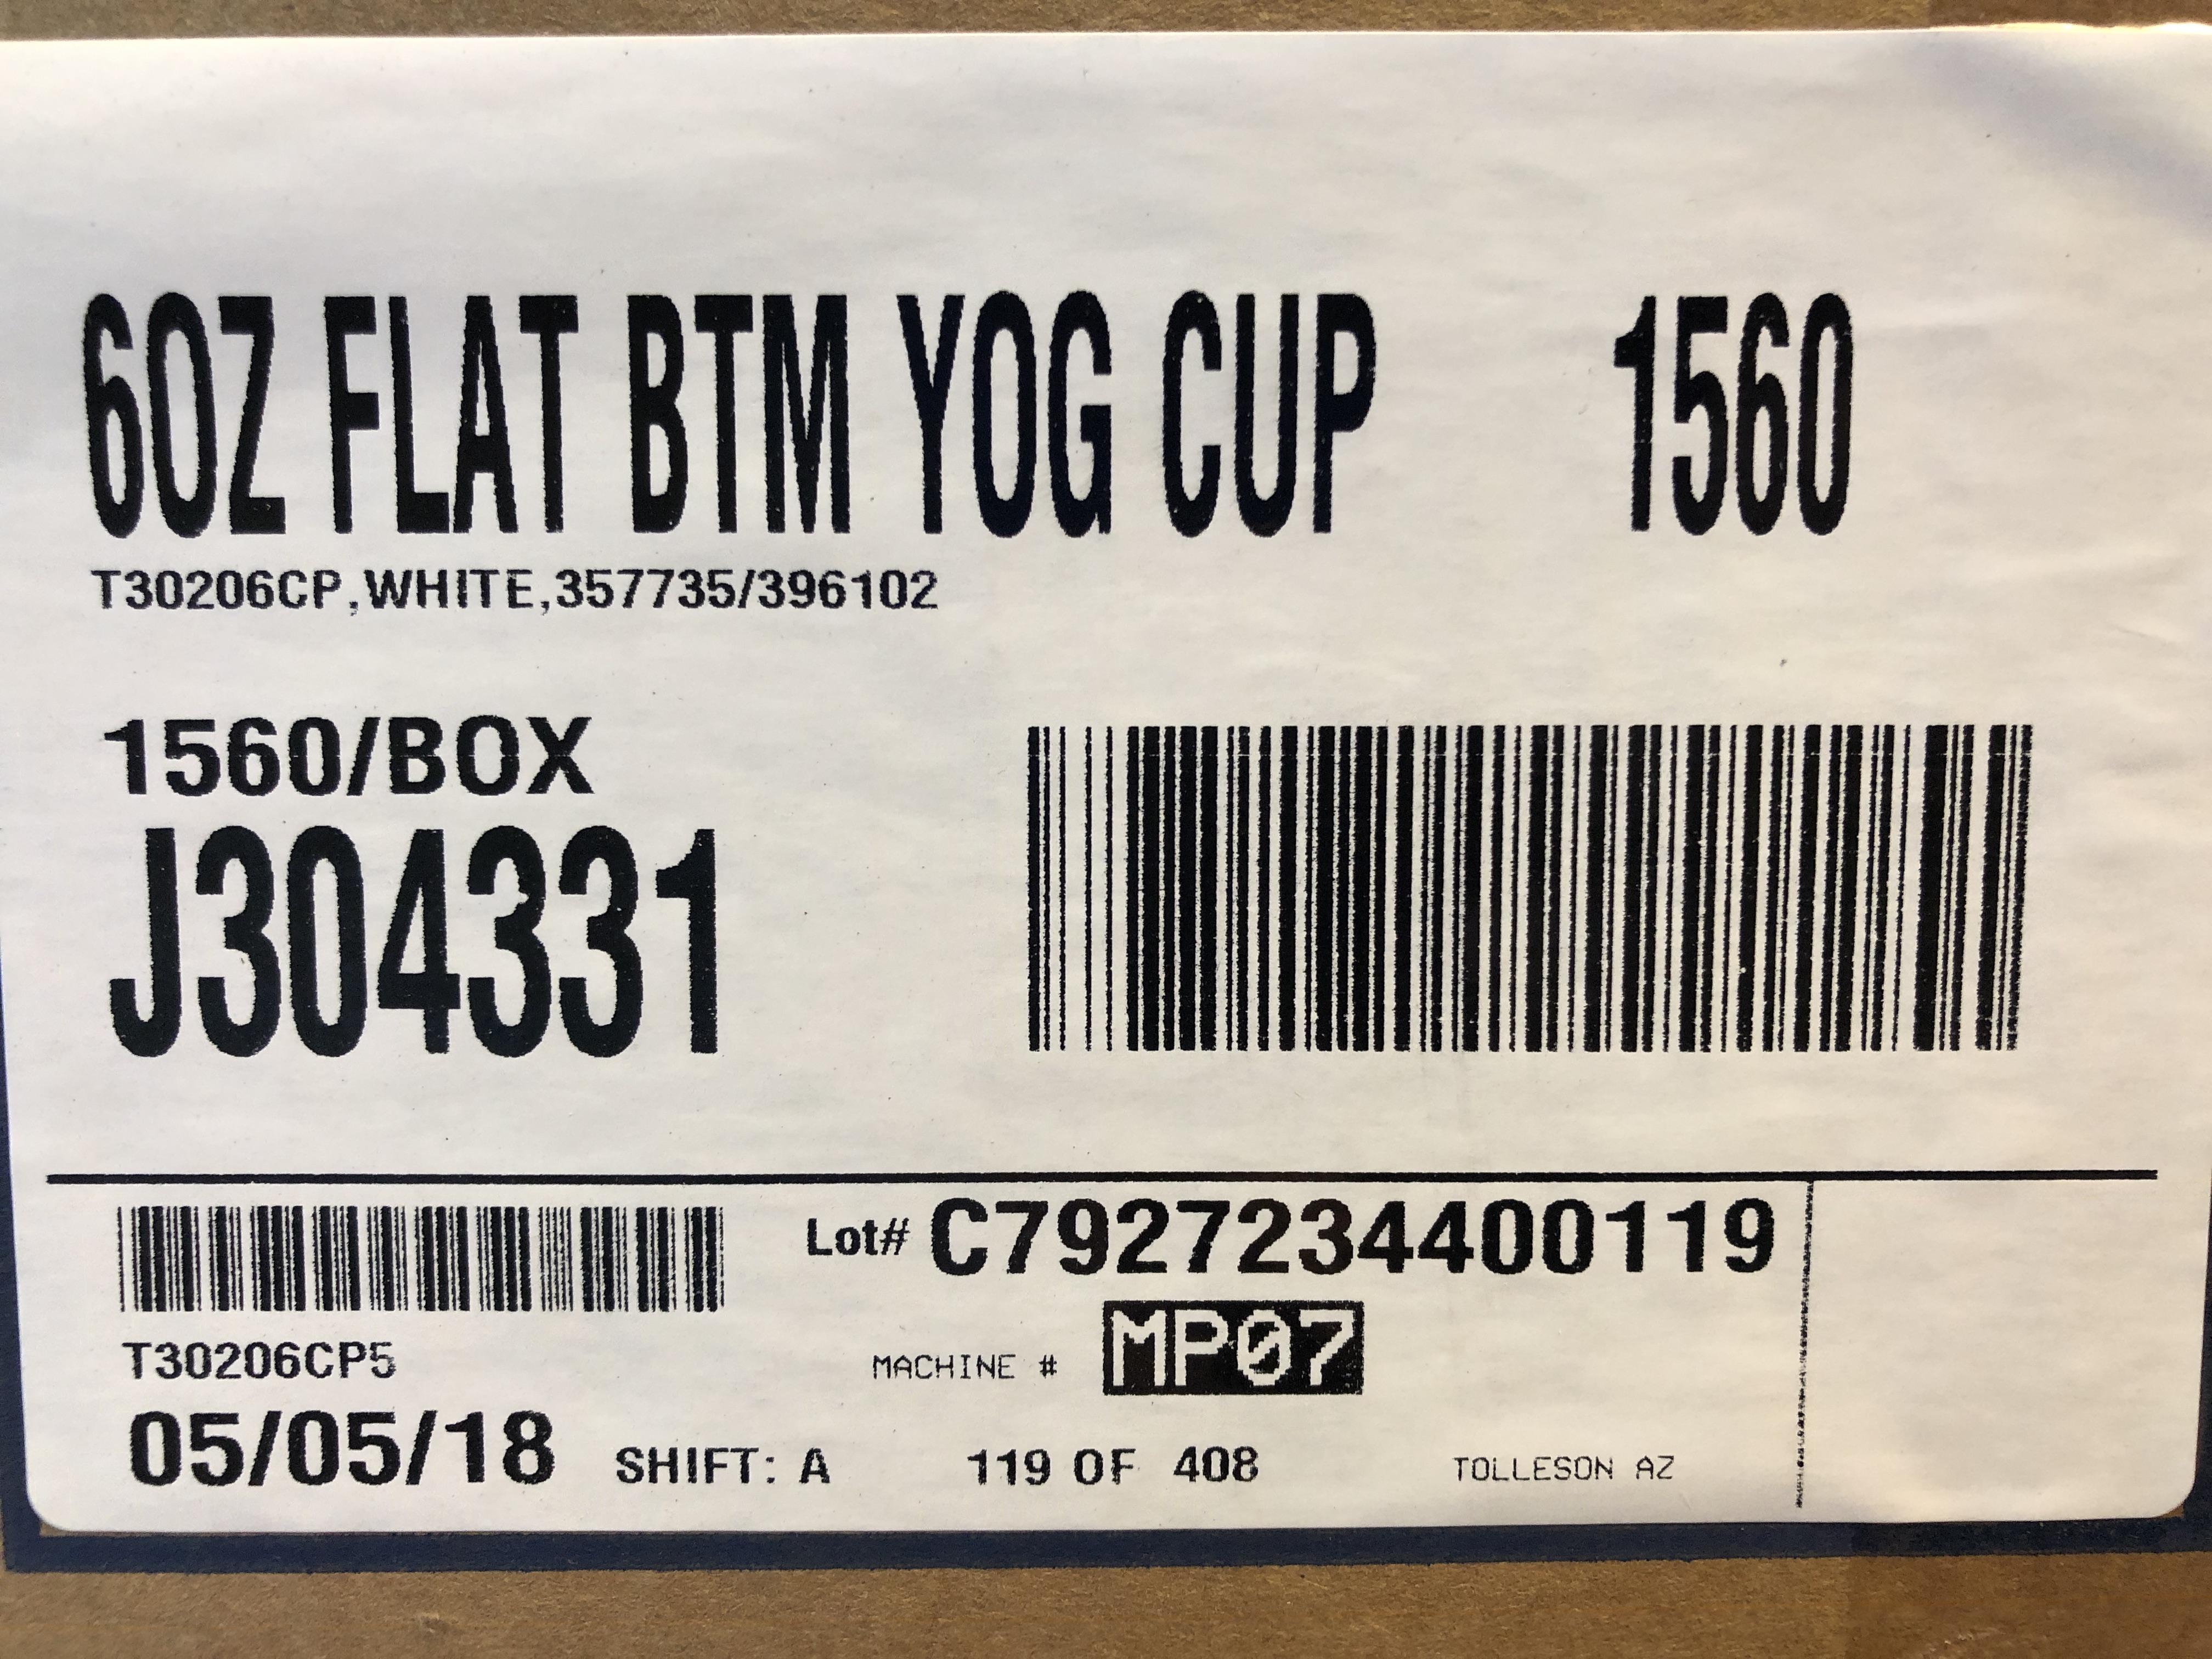 2013 Modern Packaging Yogurt Cup / Bottle Filler with Foil Seal Applicator and Heat Sealer - Image 13 of 14